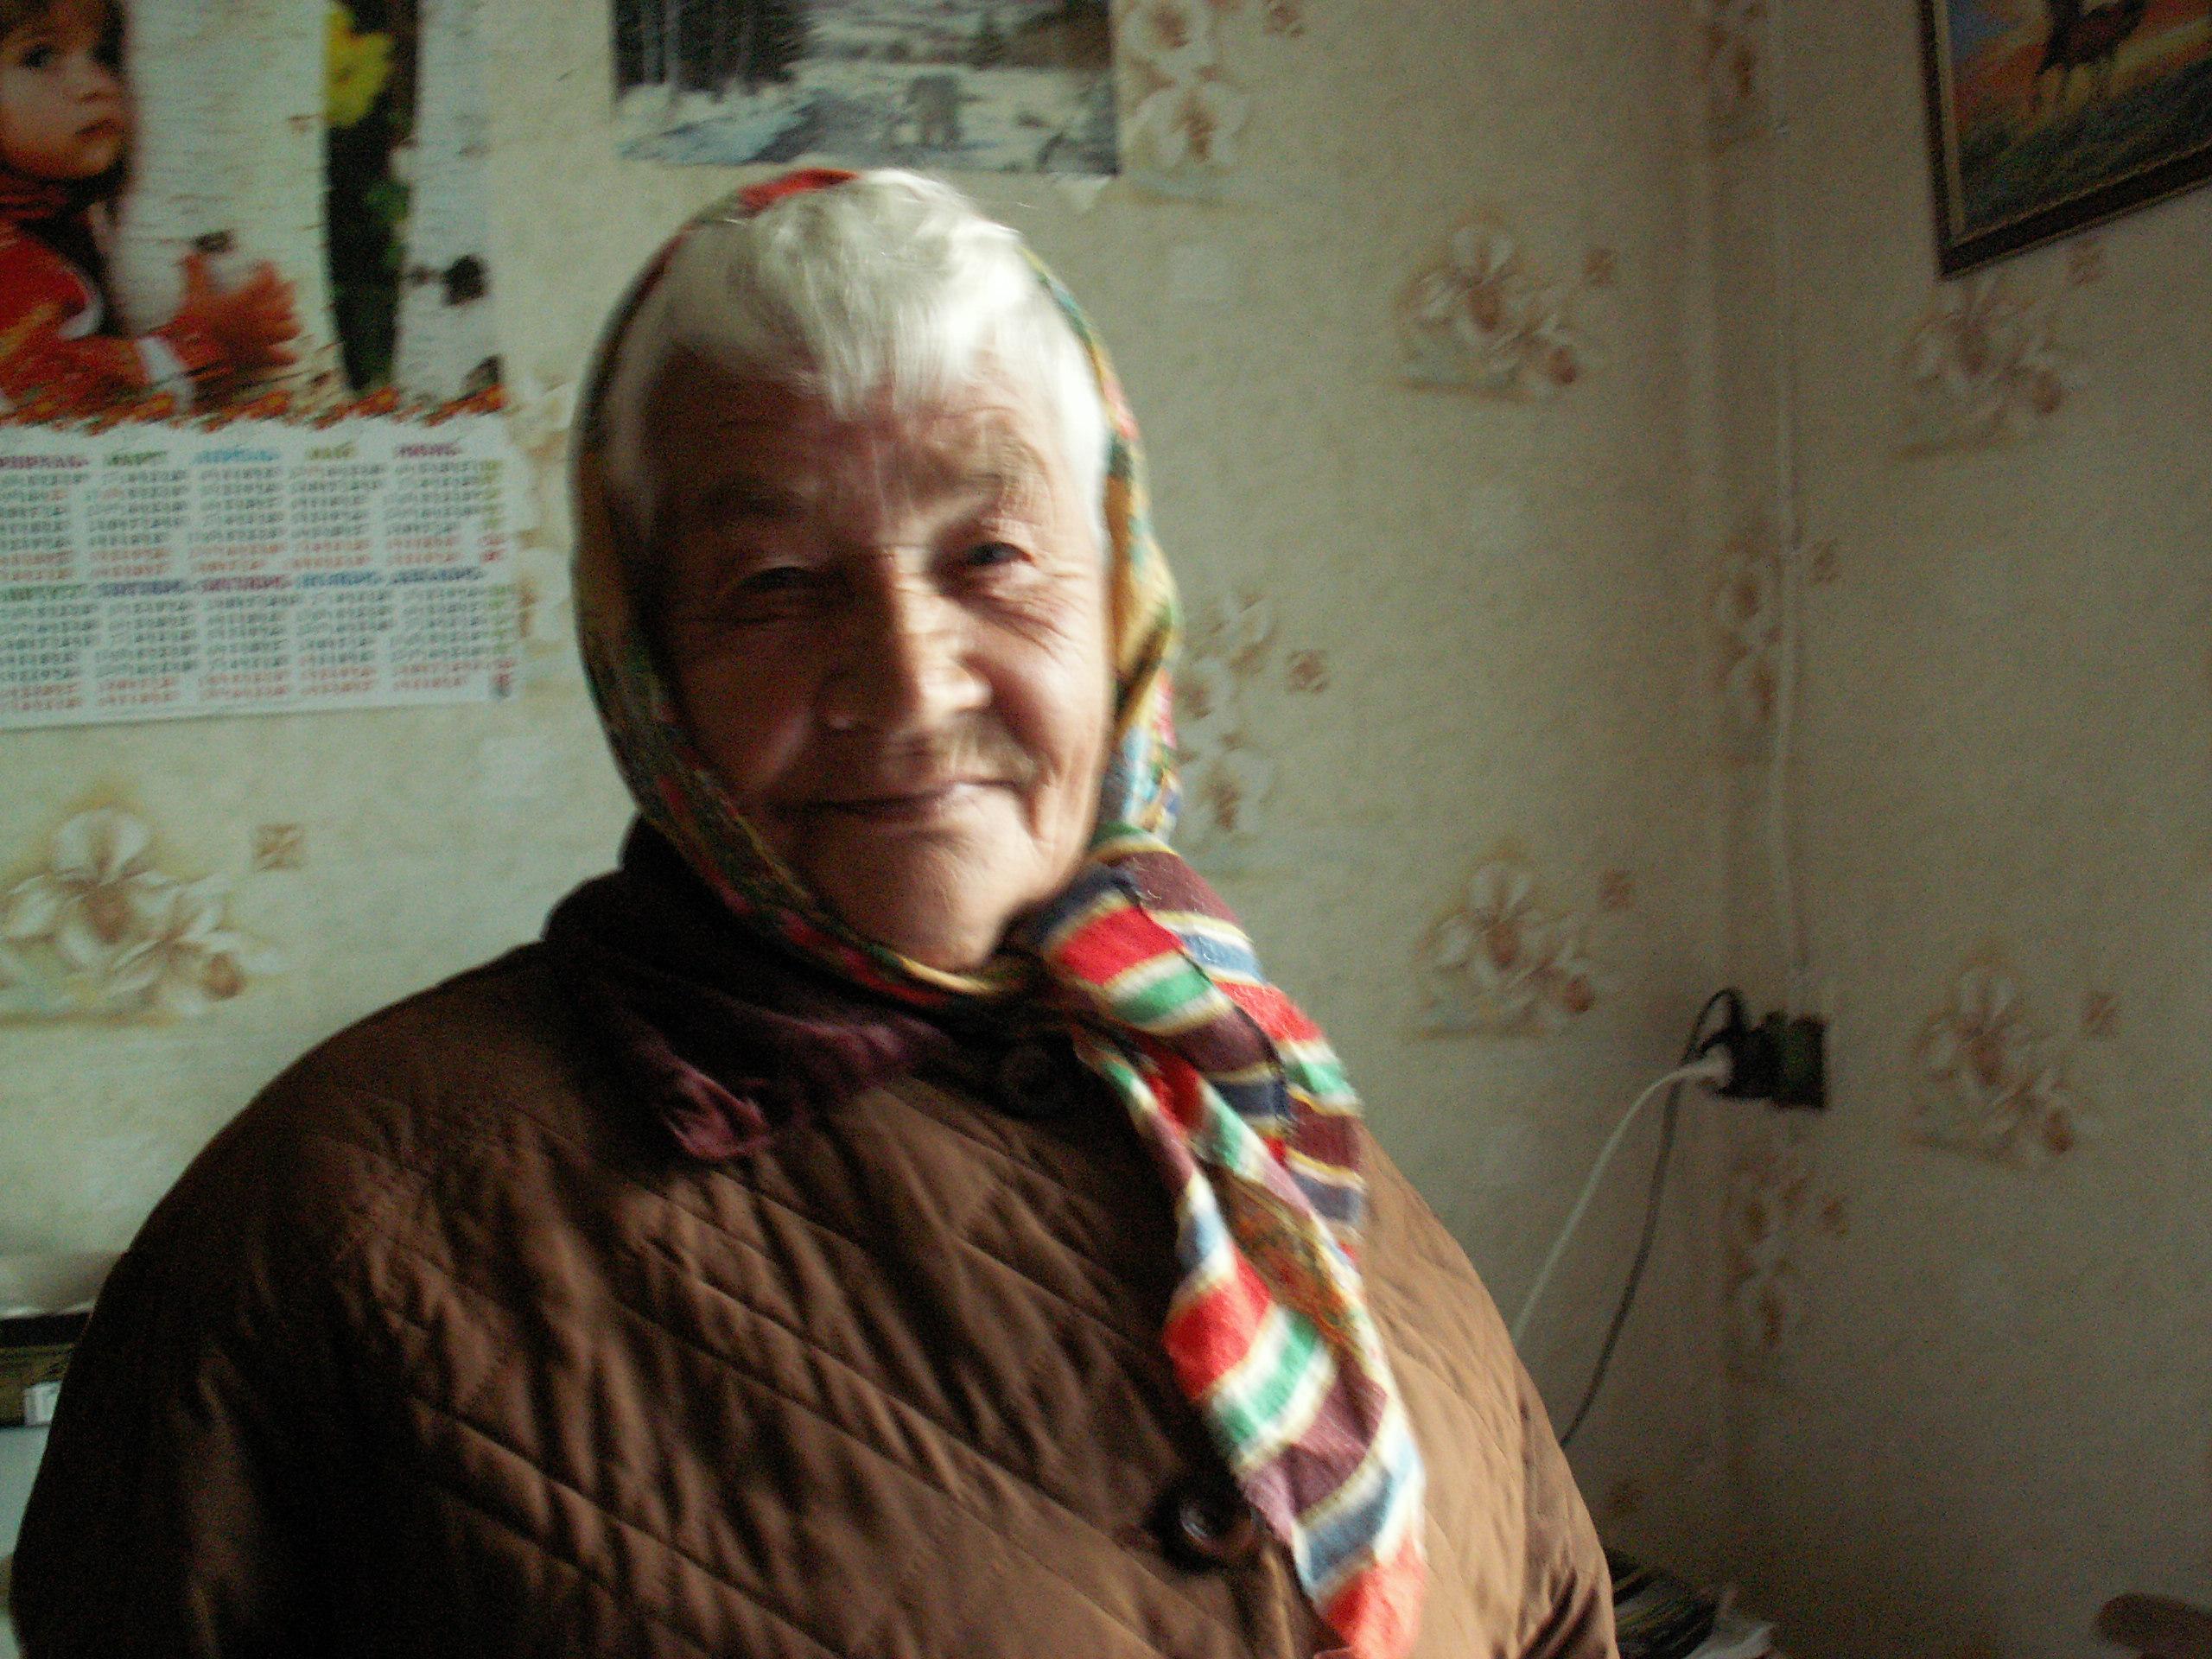 Галина Александровна Политова. Фото: Татьяна Смирнова